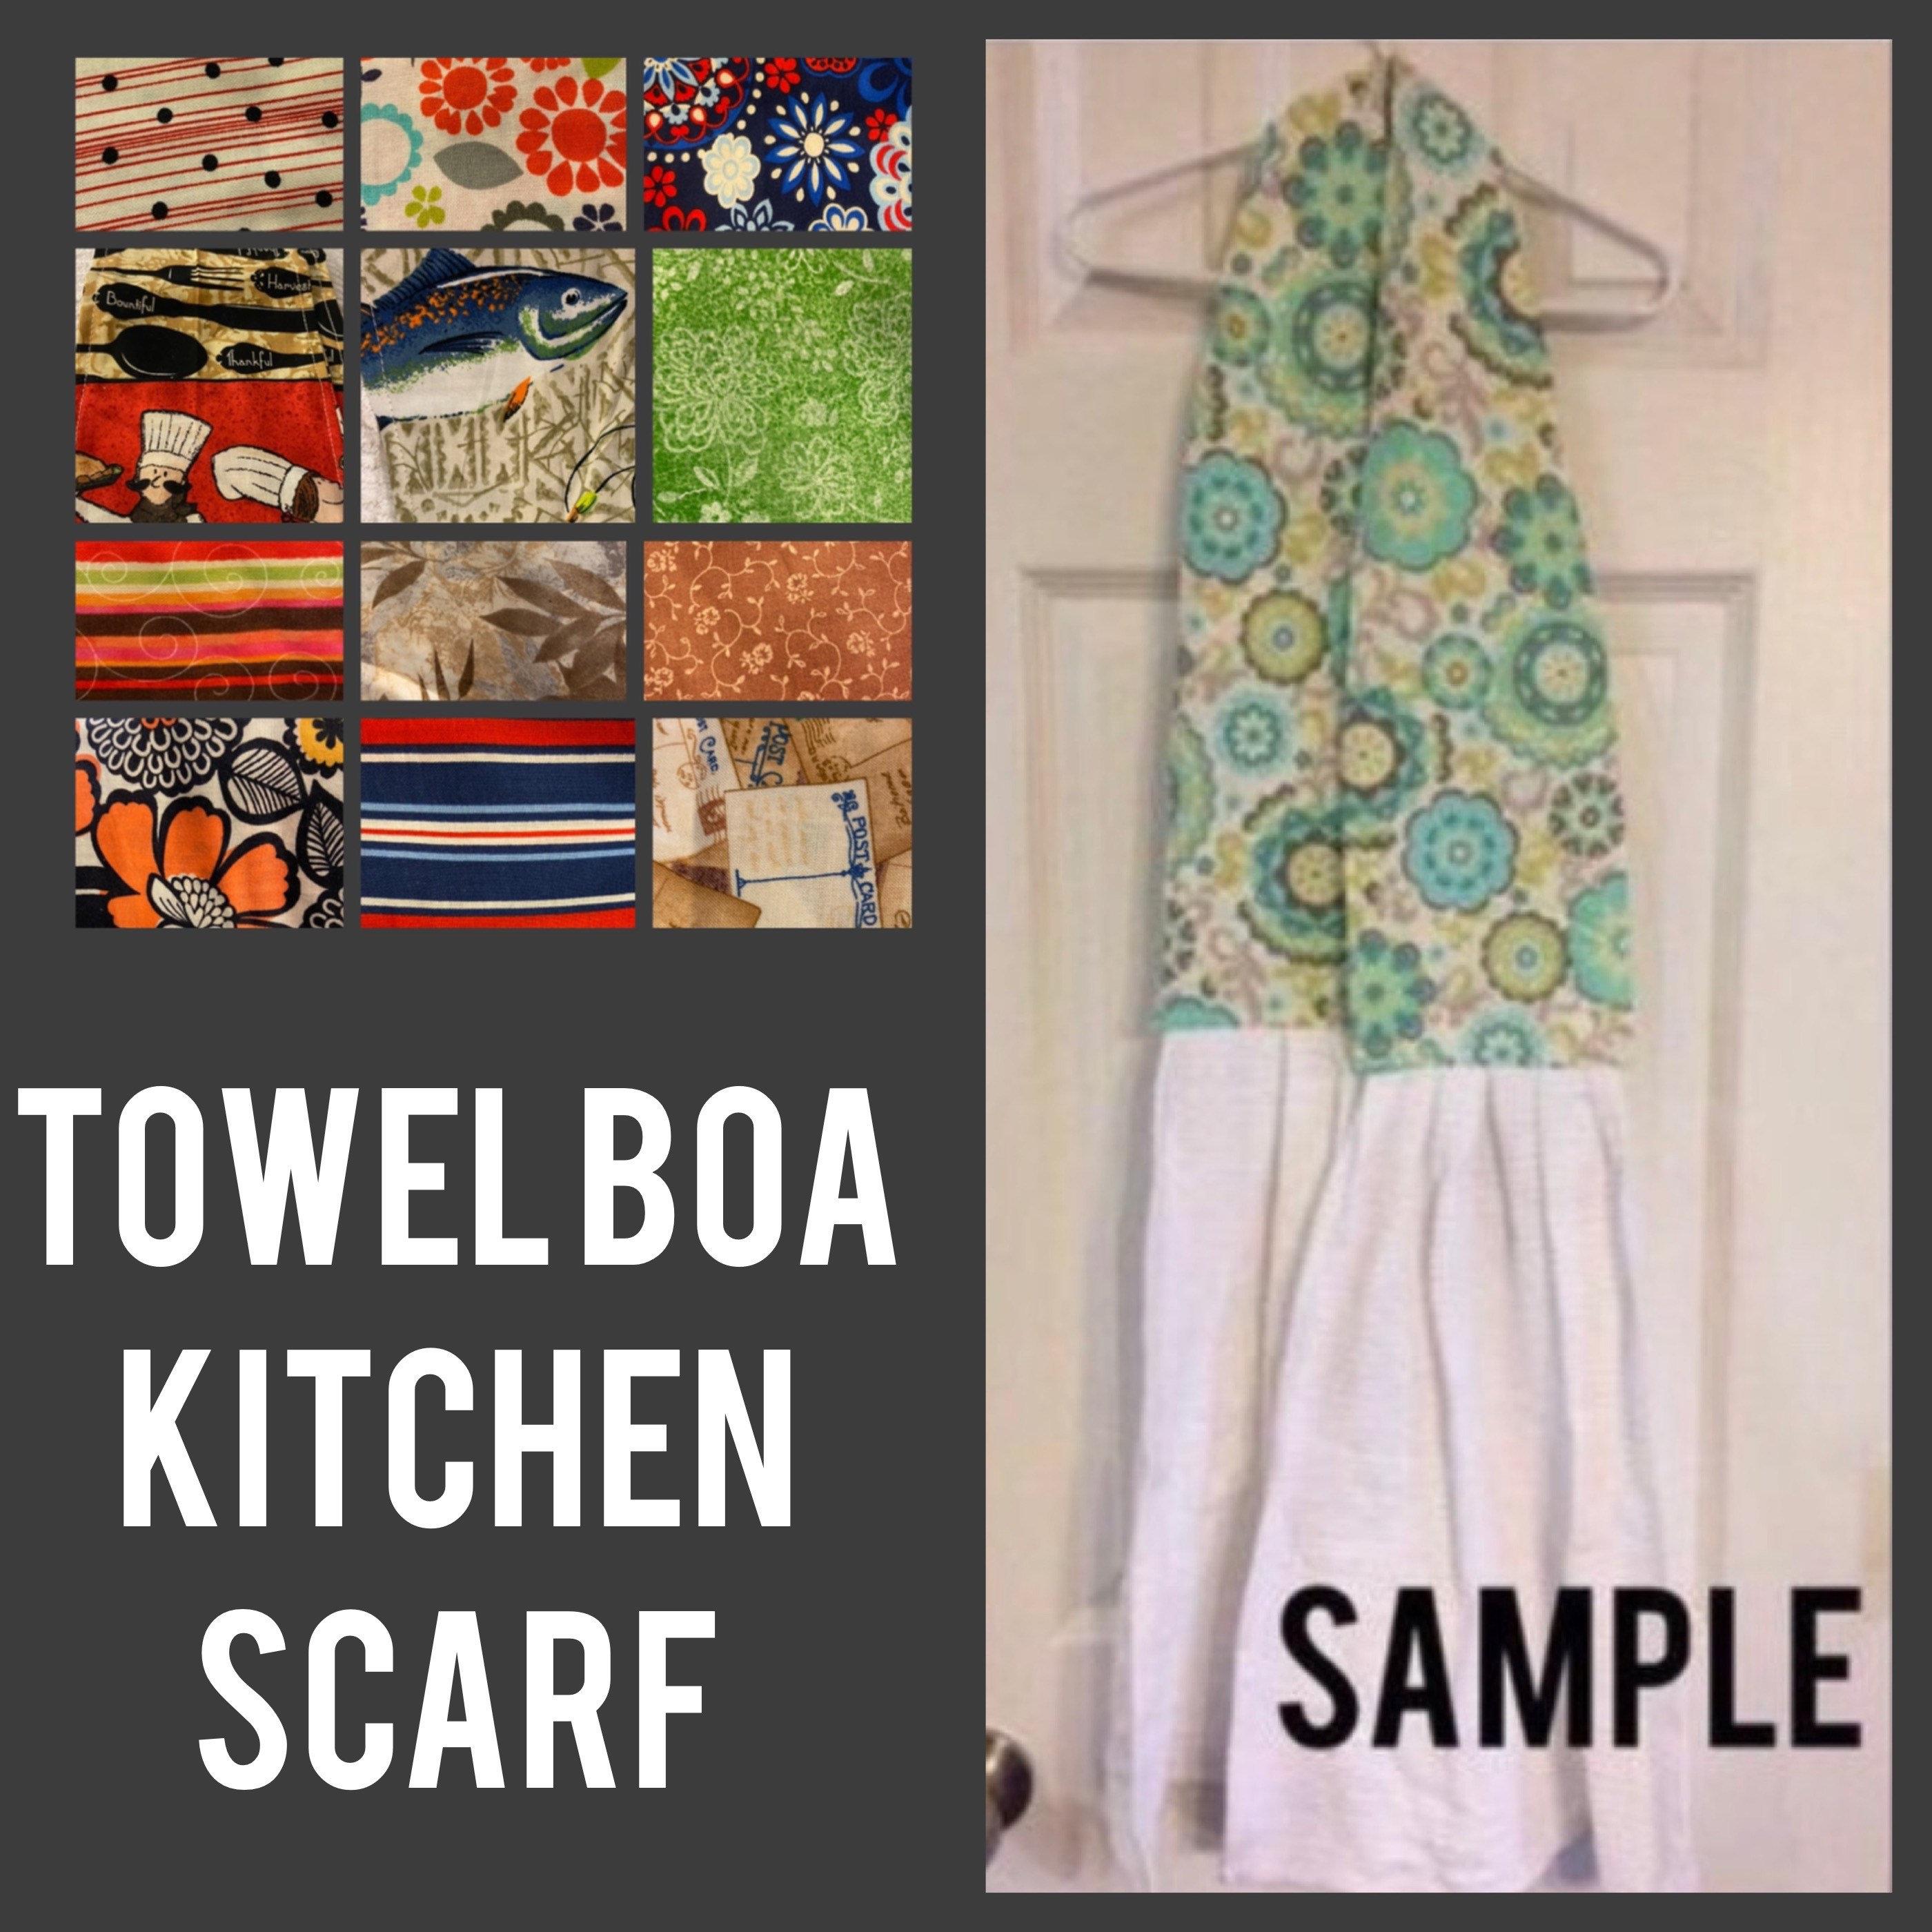 Kitchen Boa Kitchen Towel Kitchen Scarf Neck Towel Dish Etsy